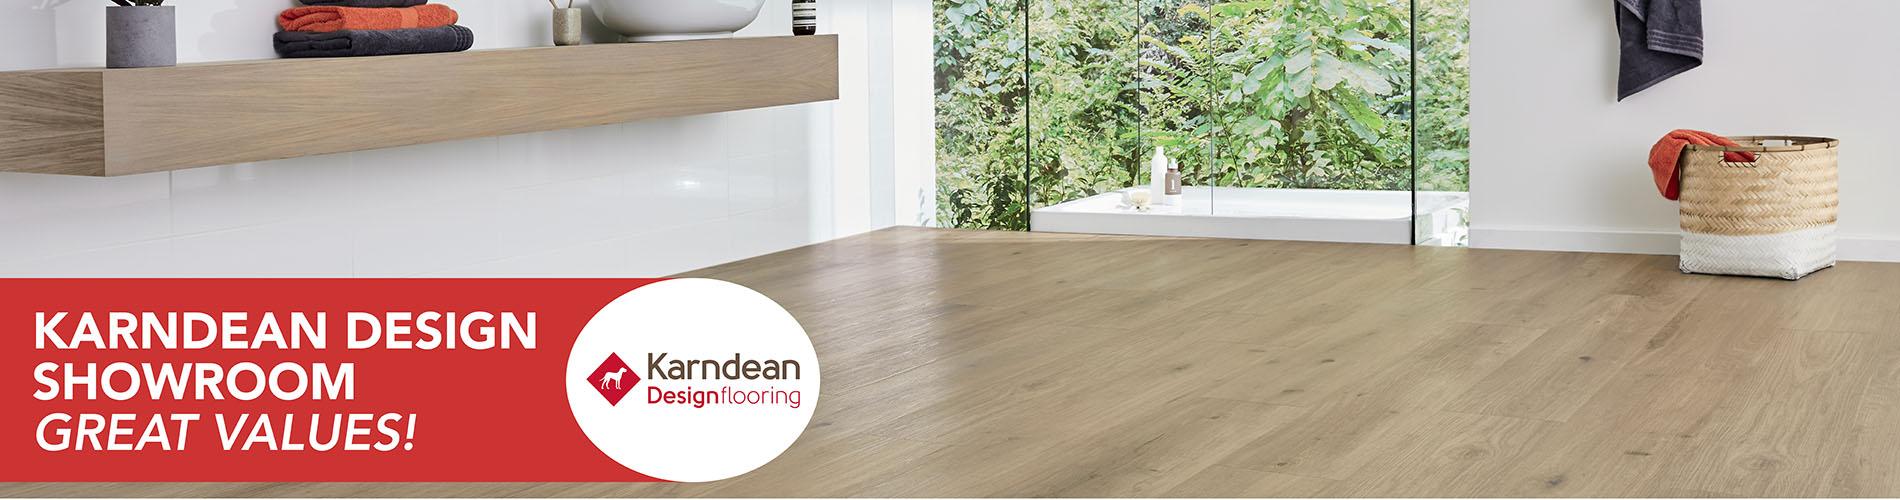 Karndean Design Showroom flooring at Castle Floors in Mesa AZ. Great values!